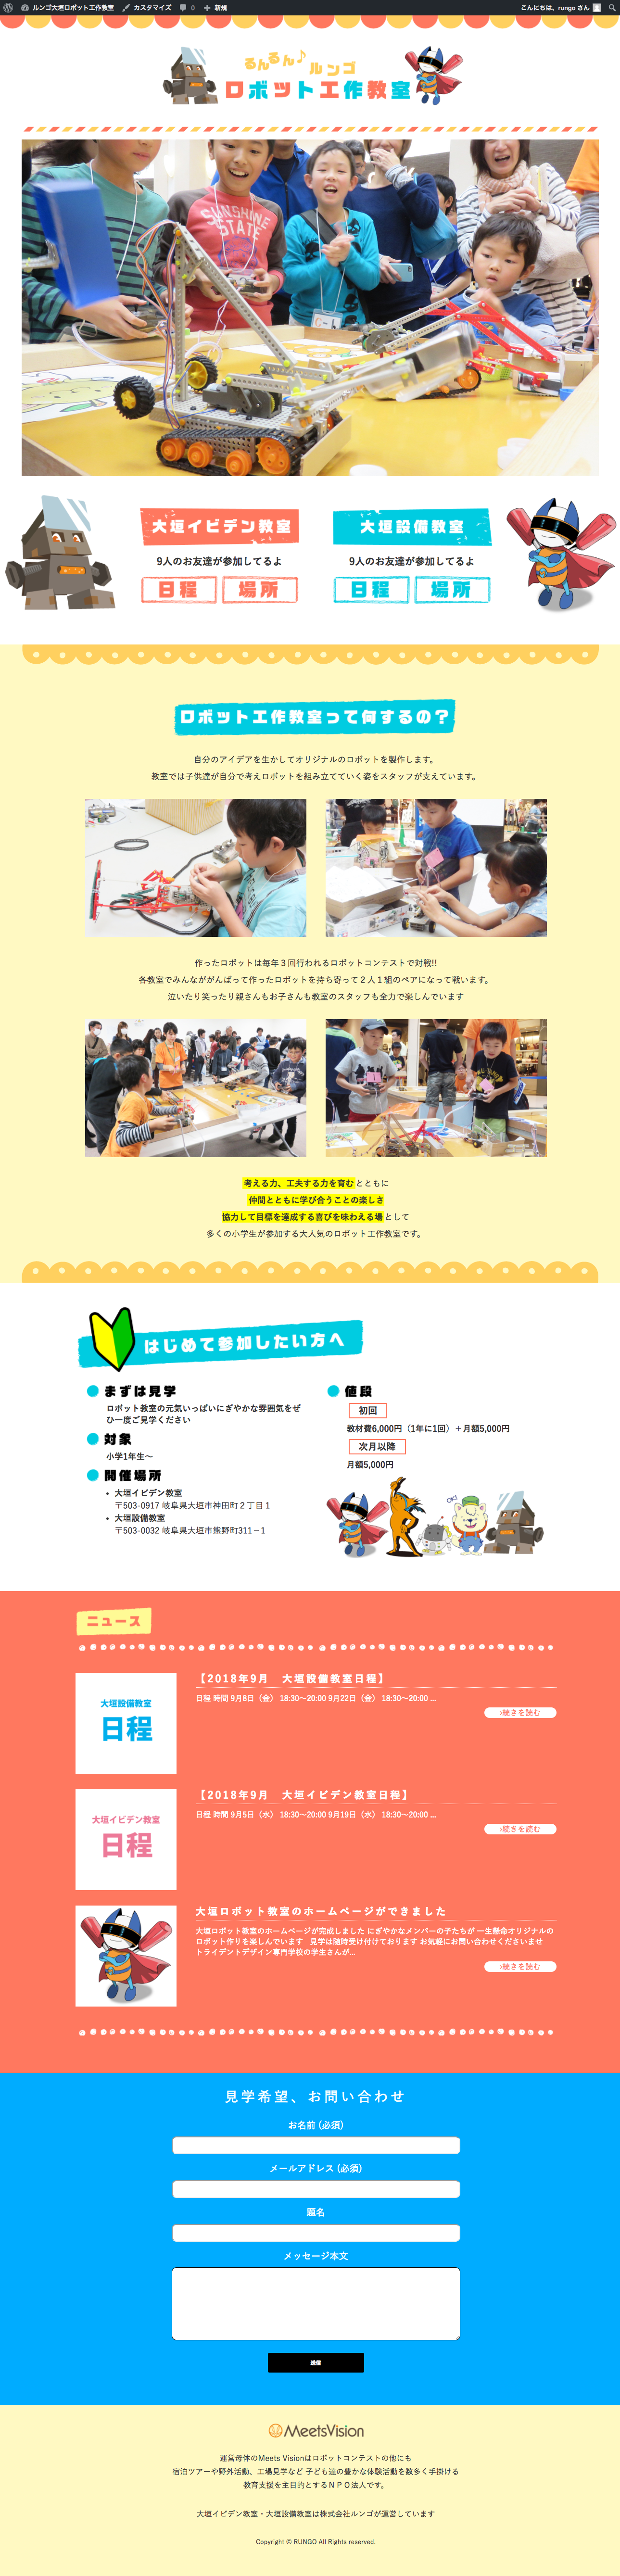 screencapture-rungo-co-jp-robot-2018-08-28-14_58_13